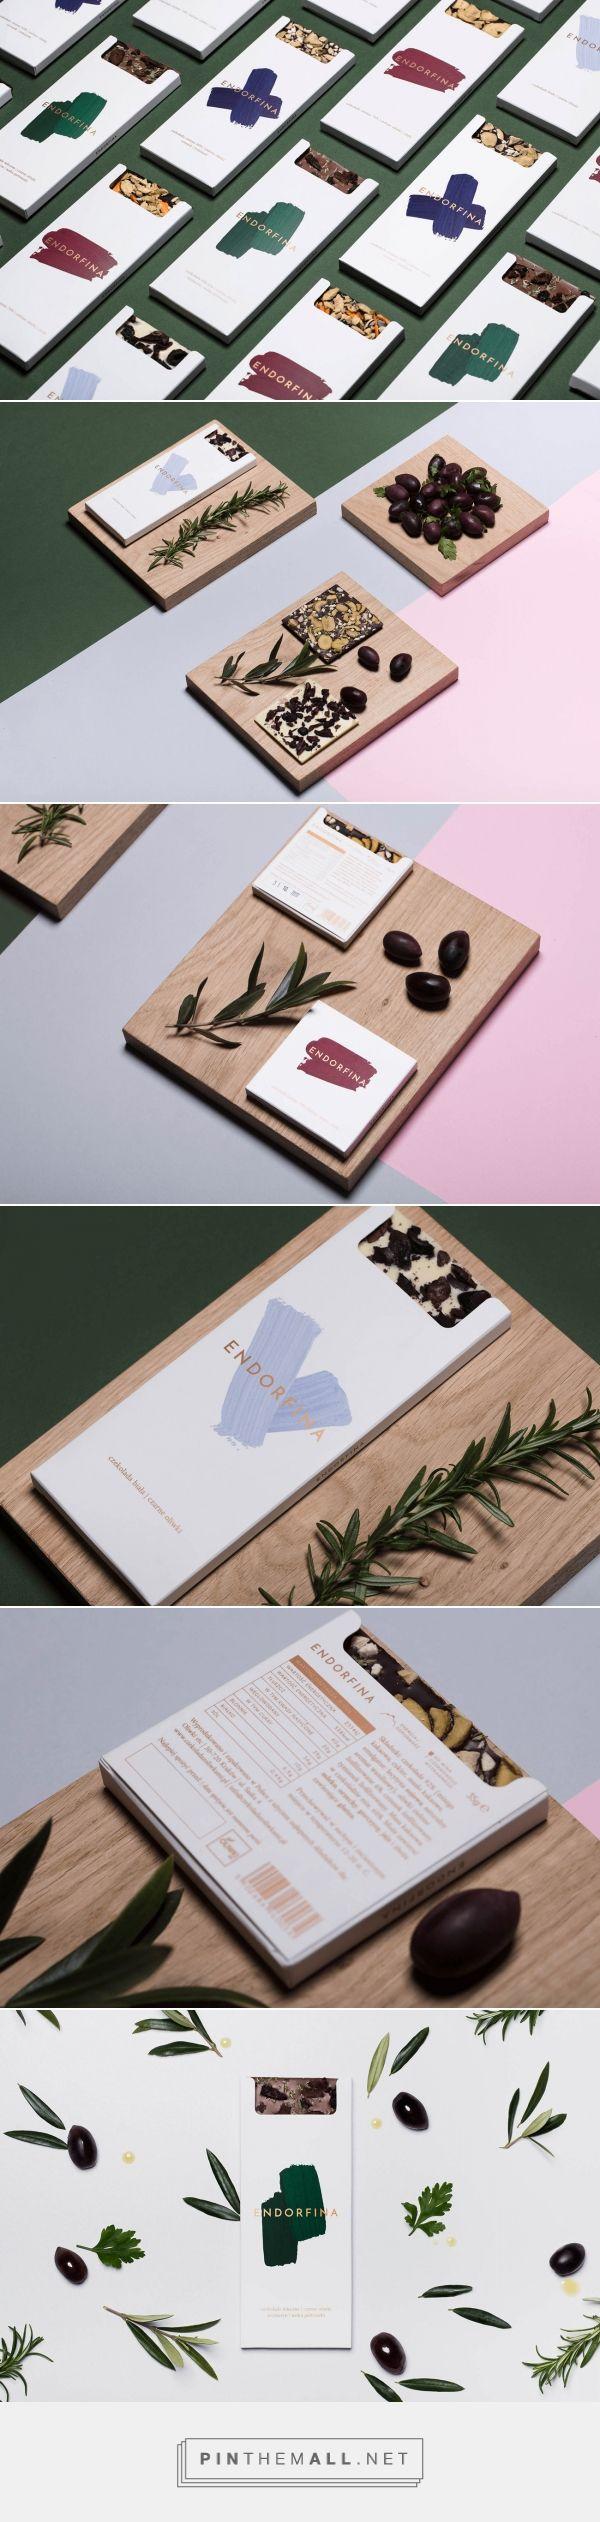 Endorfina Chocolate Packaging Design by Oliwki and Marysia Markowska, Karolina Pamuła / Package shape: Magdalena Falkiewicz / Photography: Aleksander Karkoszka - See more at: http://mindsparklemag.com/design/endorfina-chocolate-packaging-design/#sthash.9BBVbiKo.dpuf - created via https://pinthemall.net